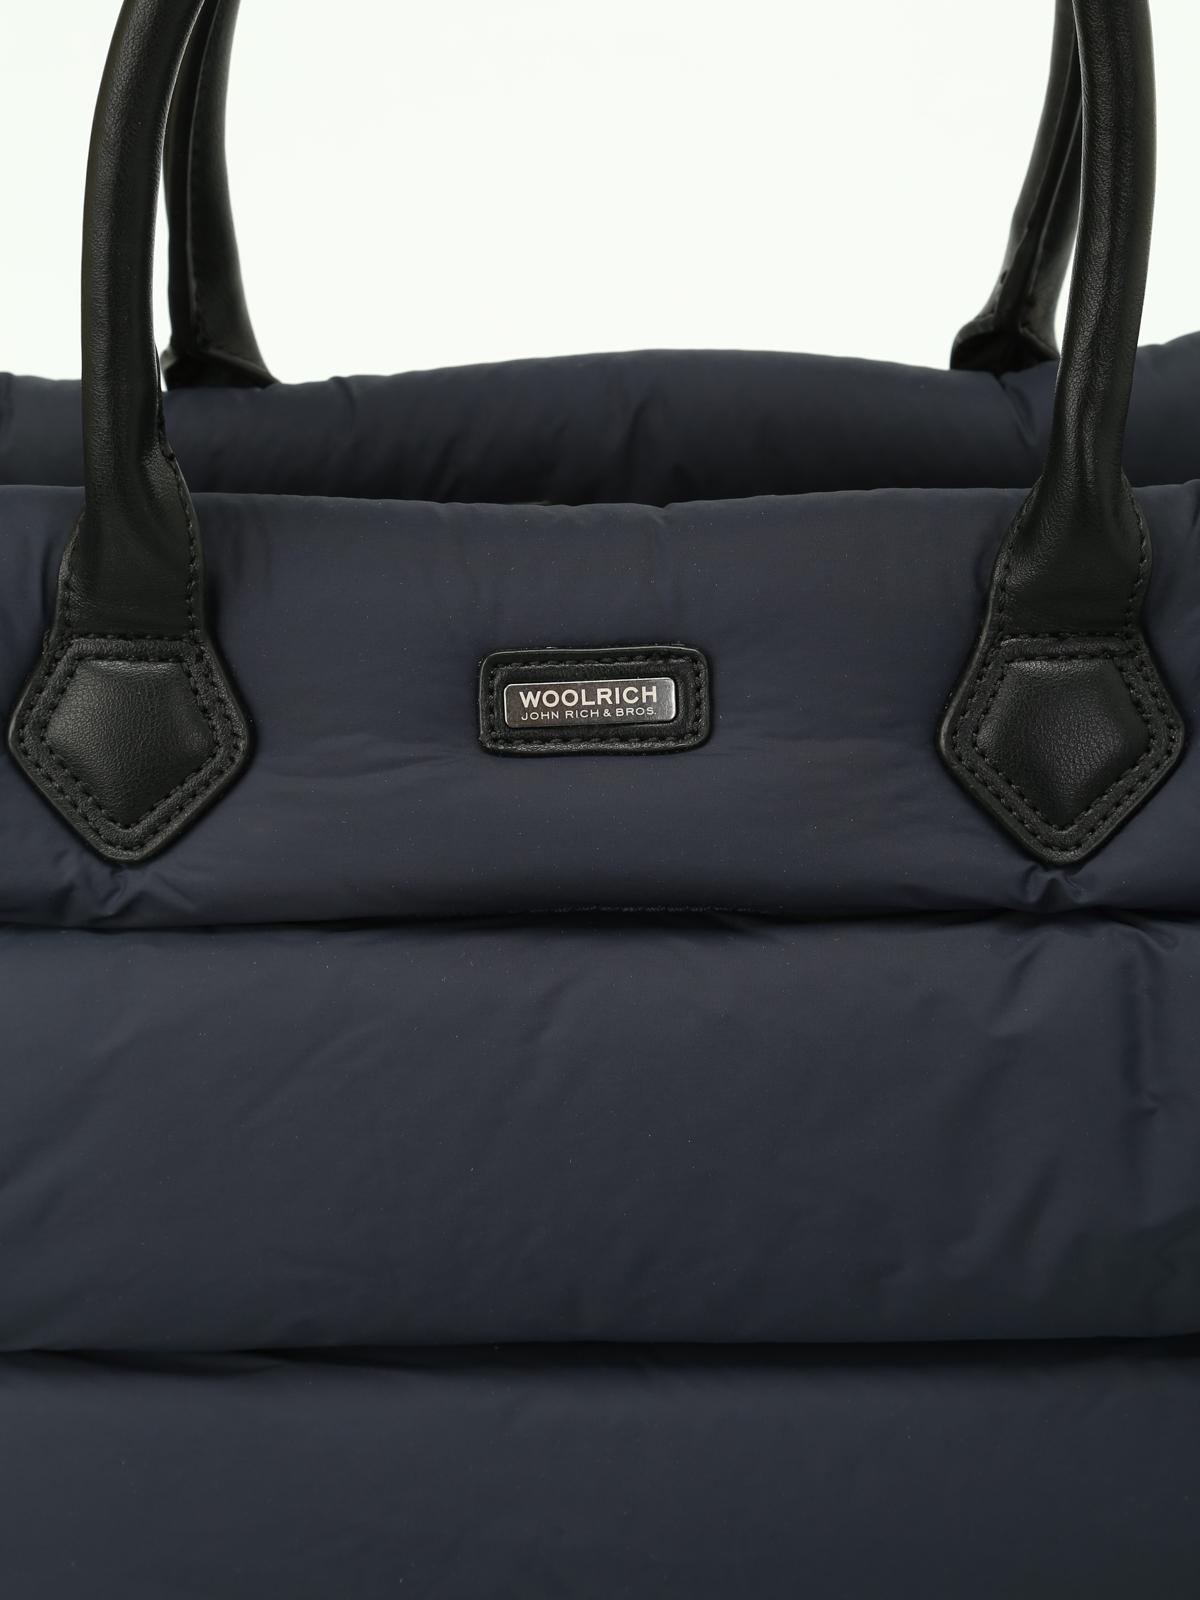 Woolrich - Borsa in nylon imbottito con zip - shopper - WWBAG0127 ... d4bb5b5458b